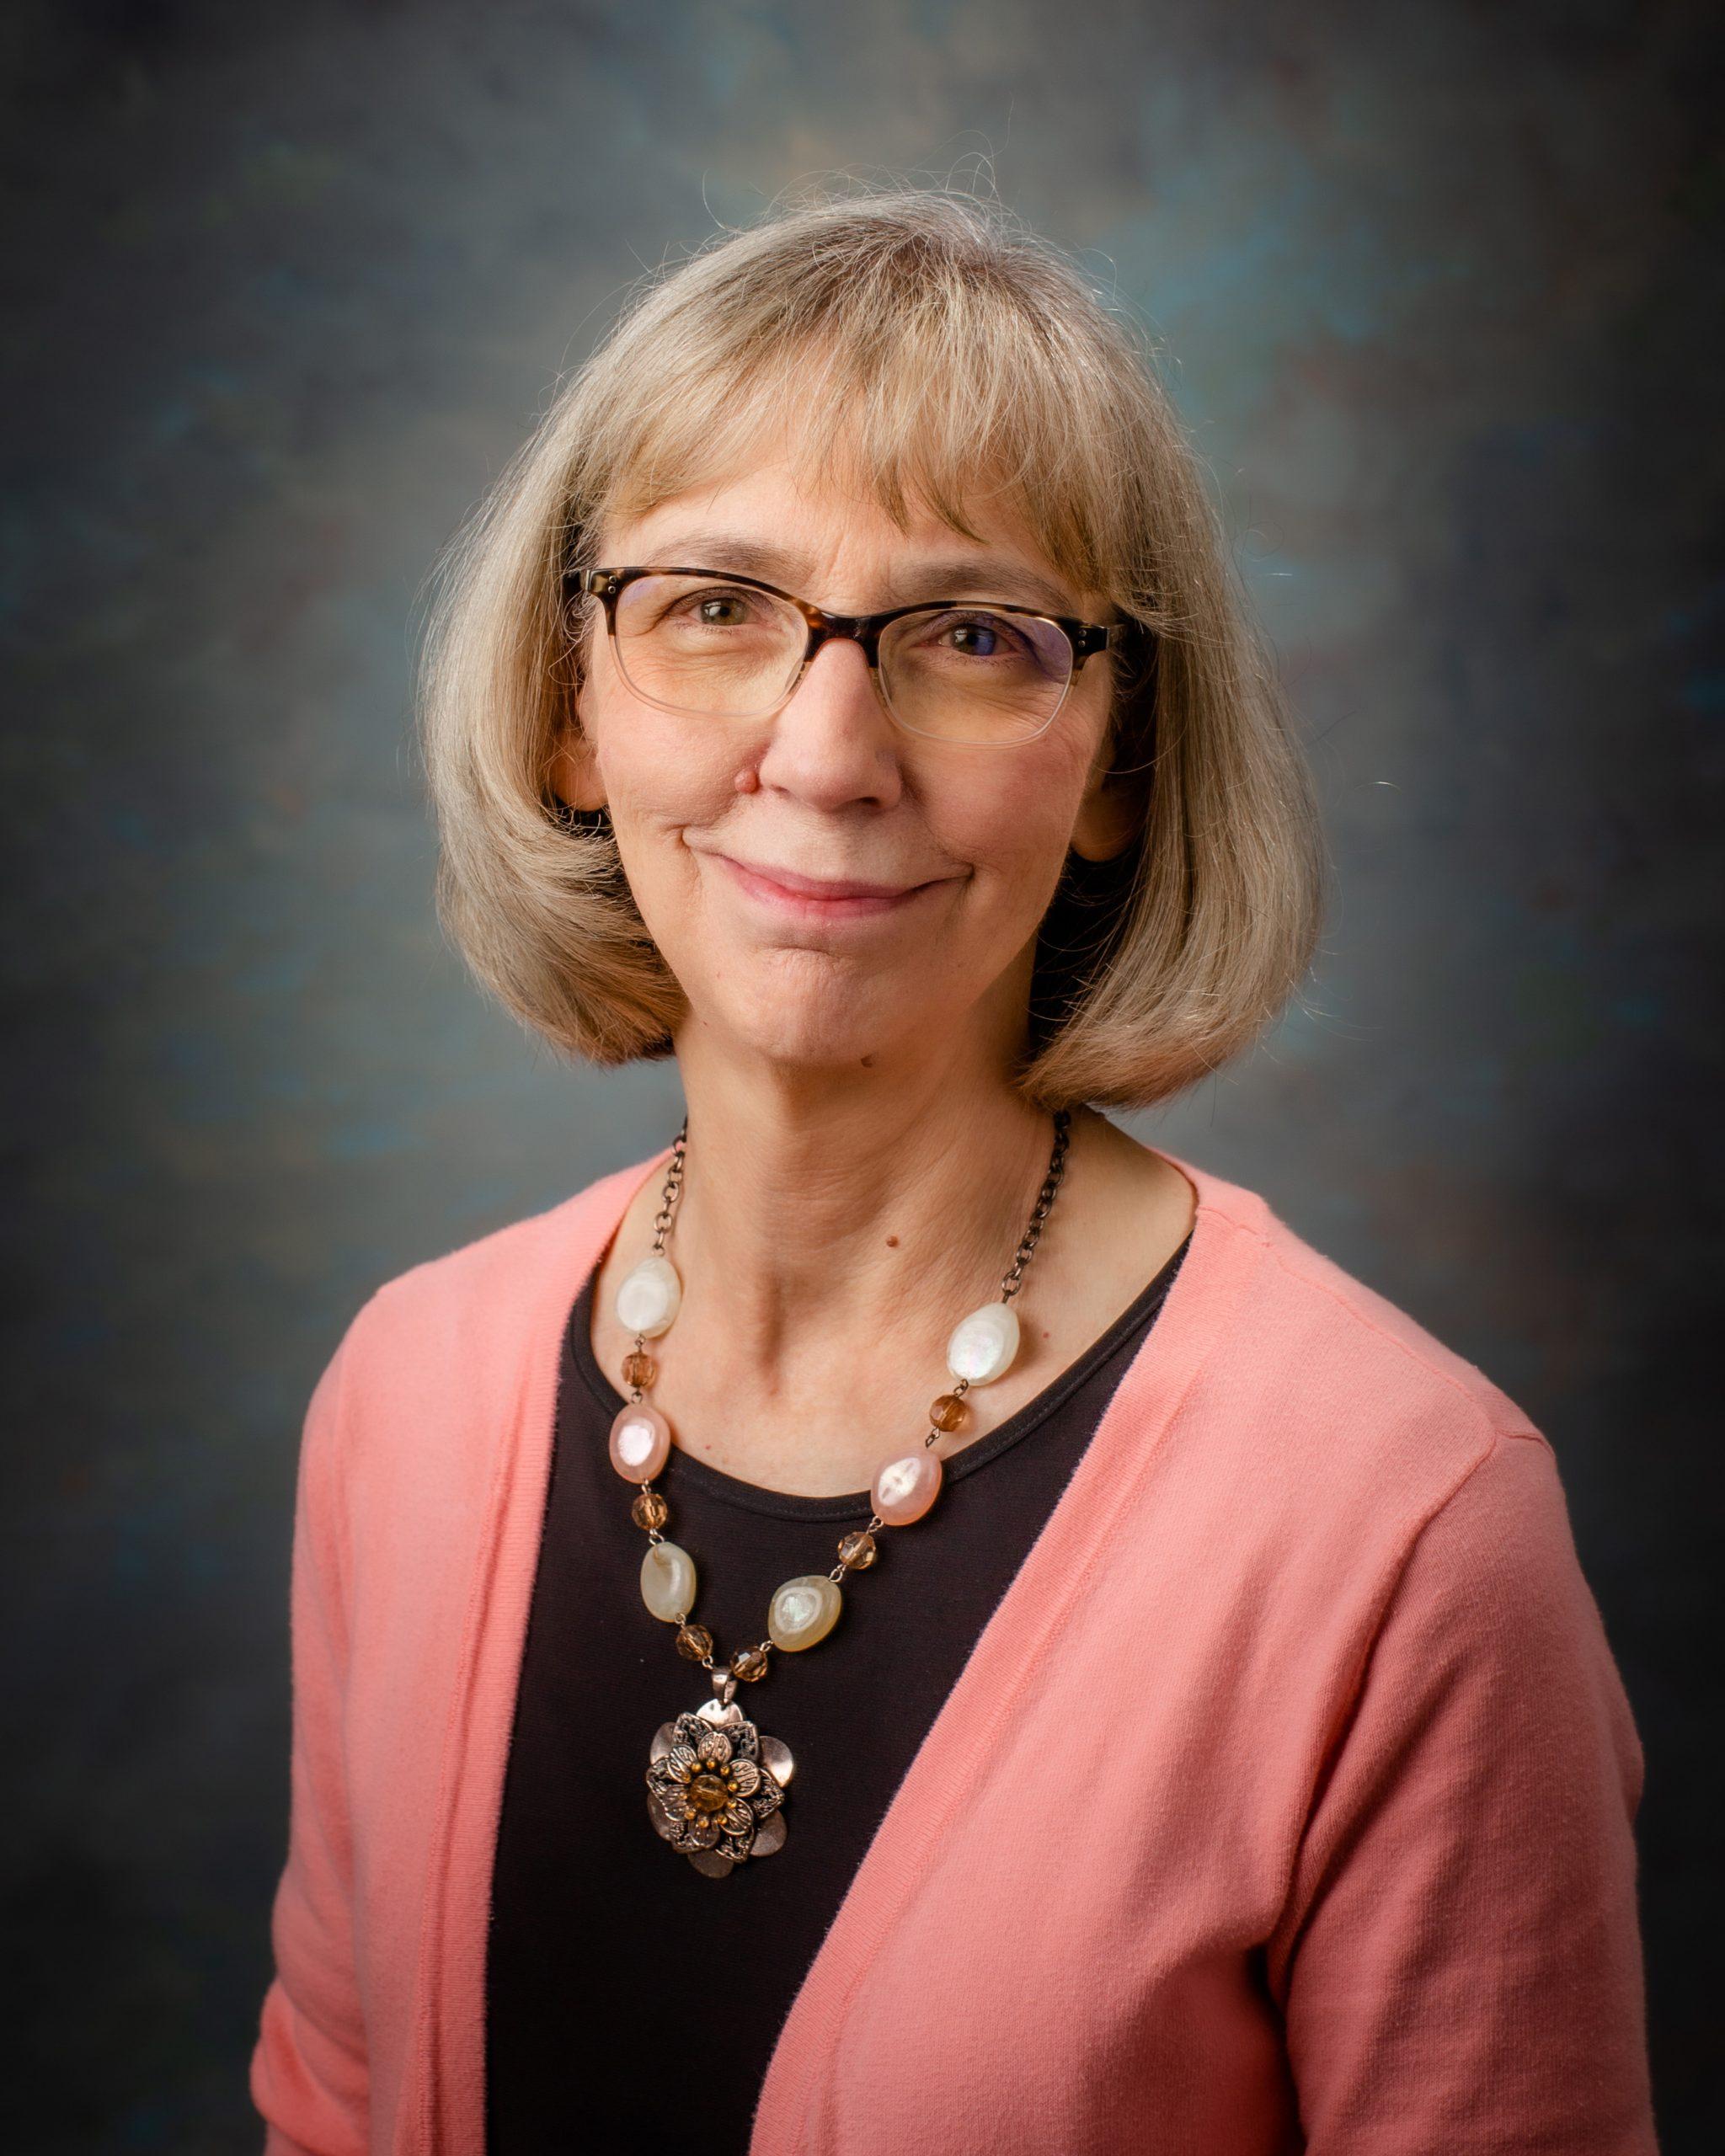 Image of Deb Robinson